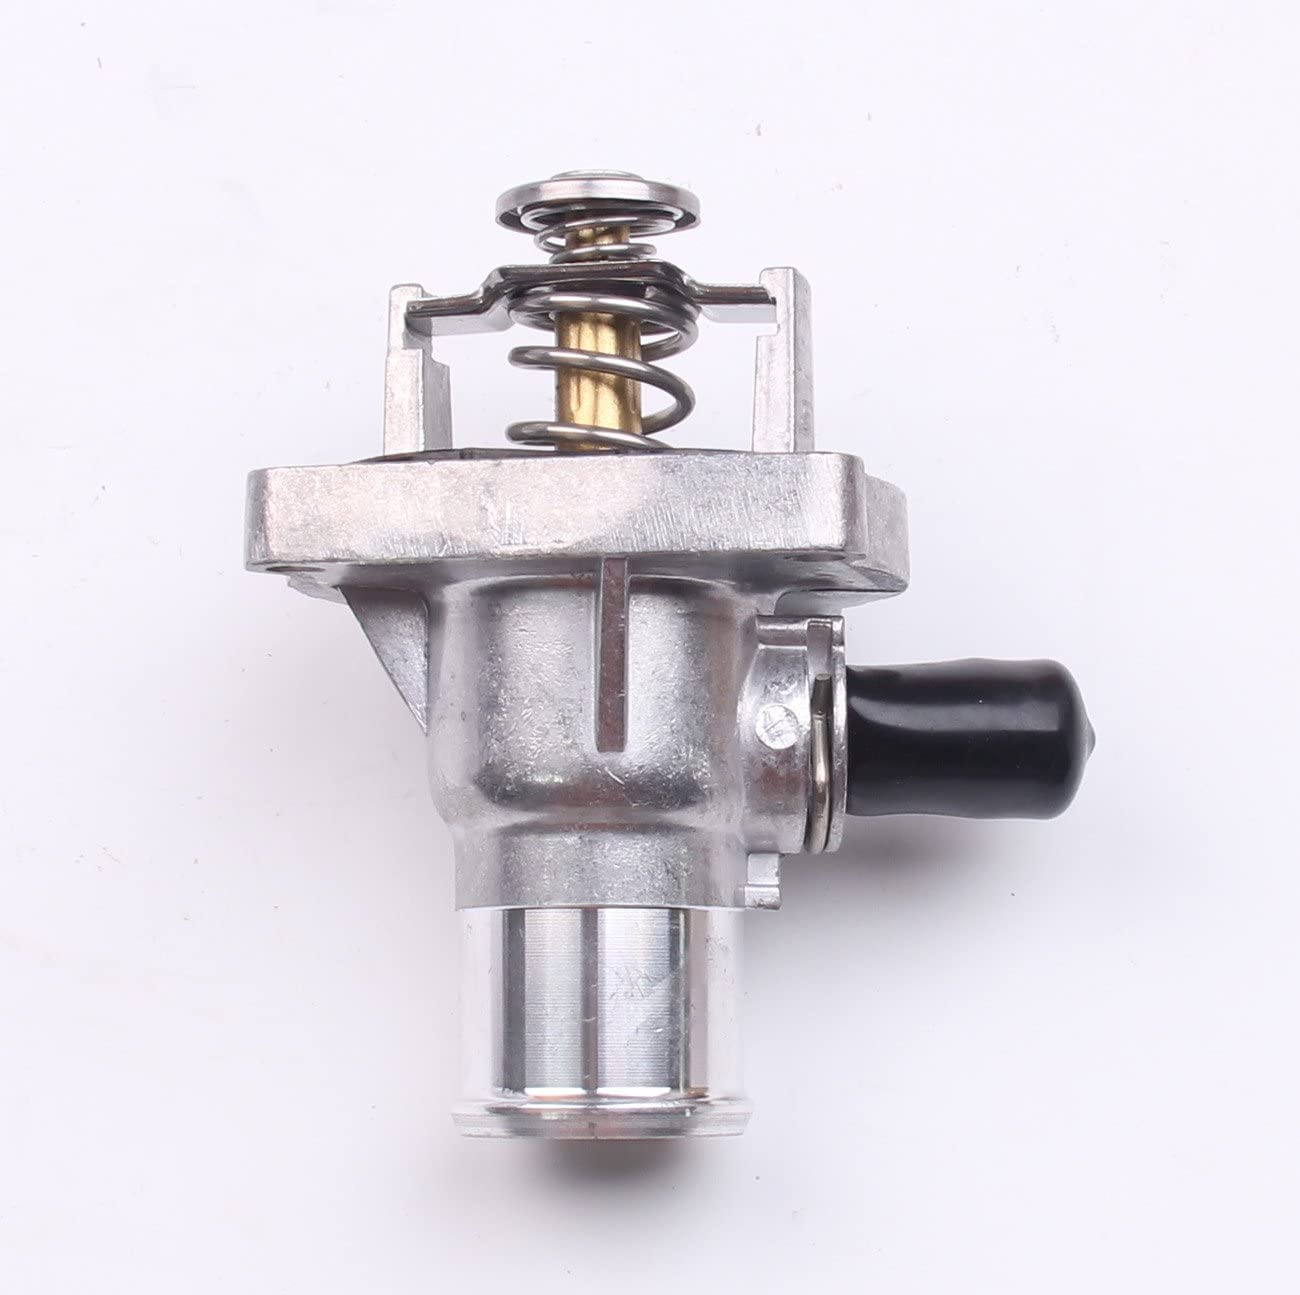 New Engine Coolant Thermostat Housing For GM Chevy Aveo Cruze SONIC Tracker Pontiac G3